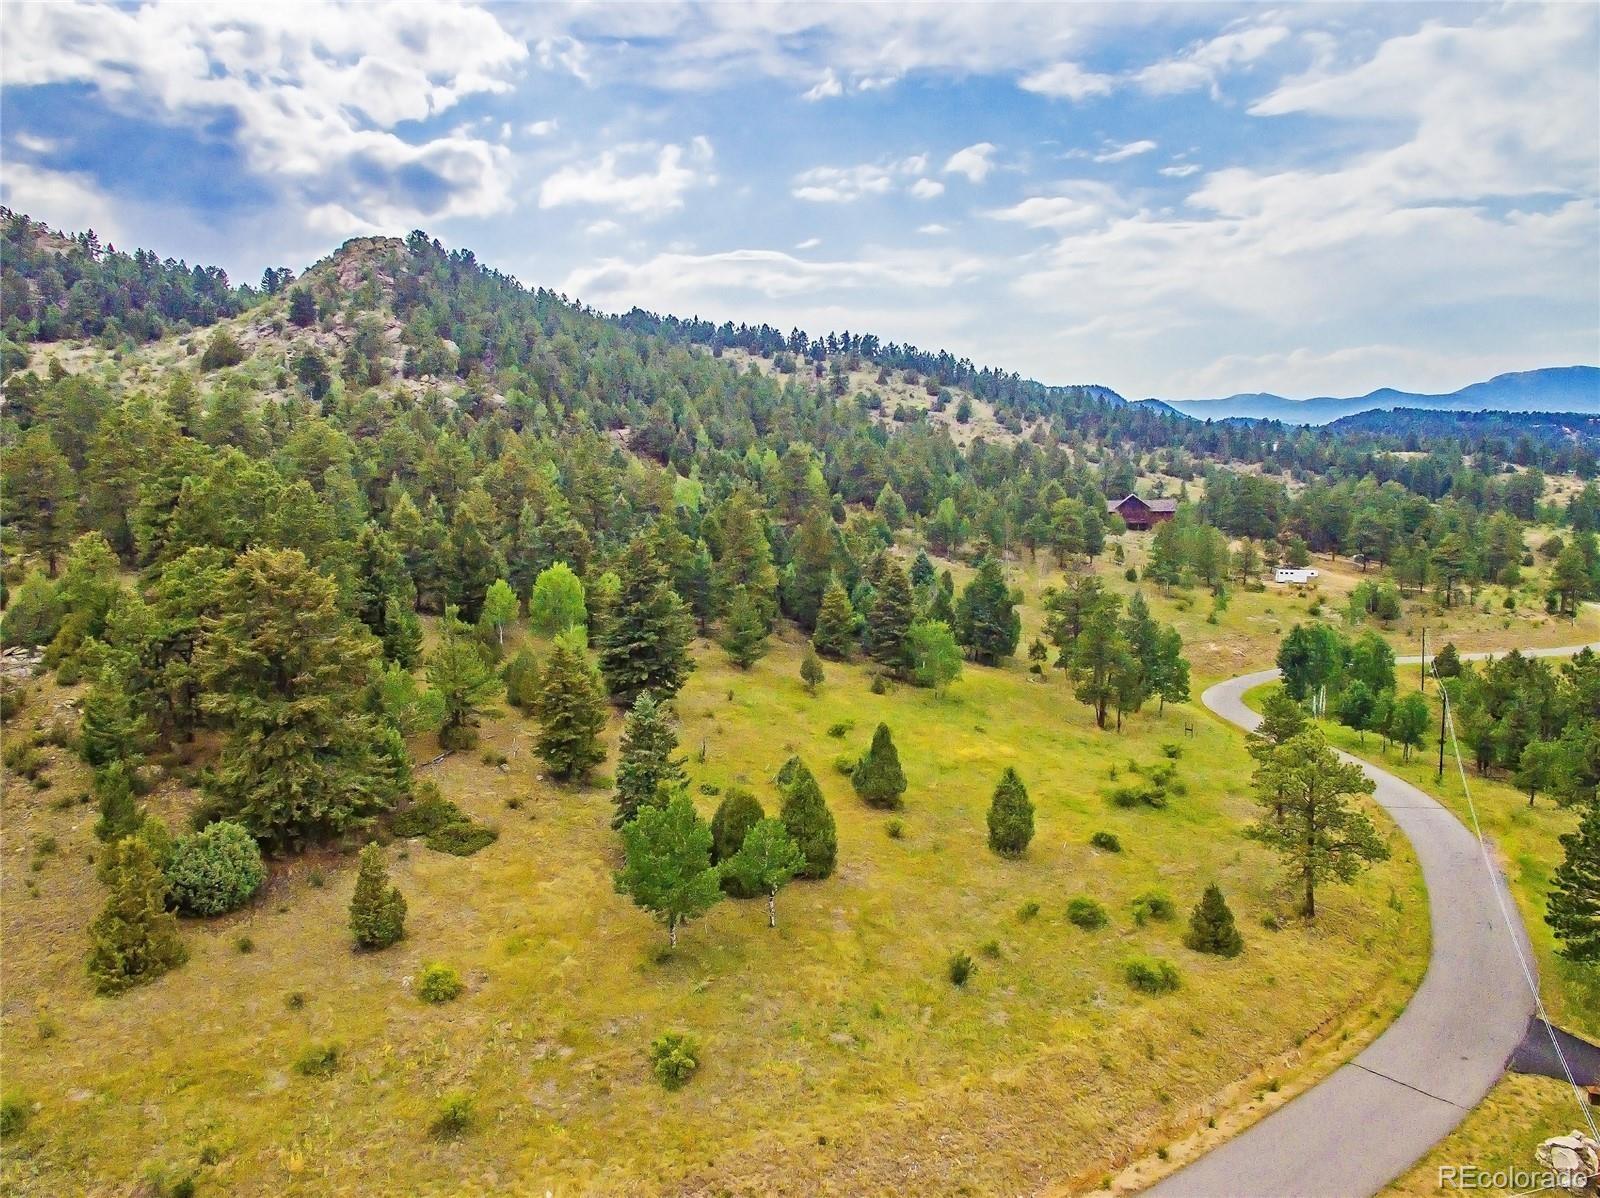 MLS# 3136640 - 2 - 14515 Reserve Road, Pine, CO 80470